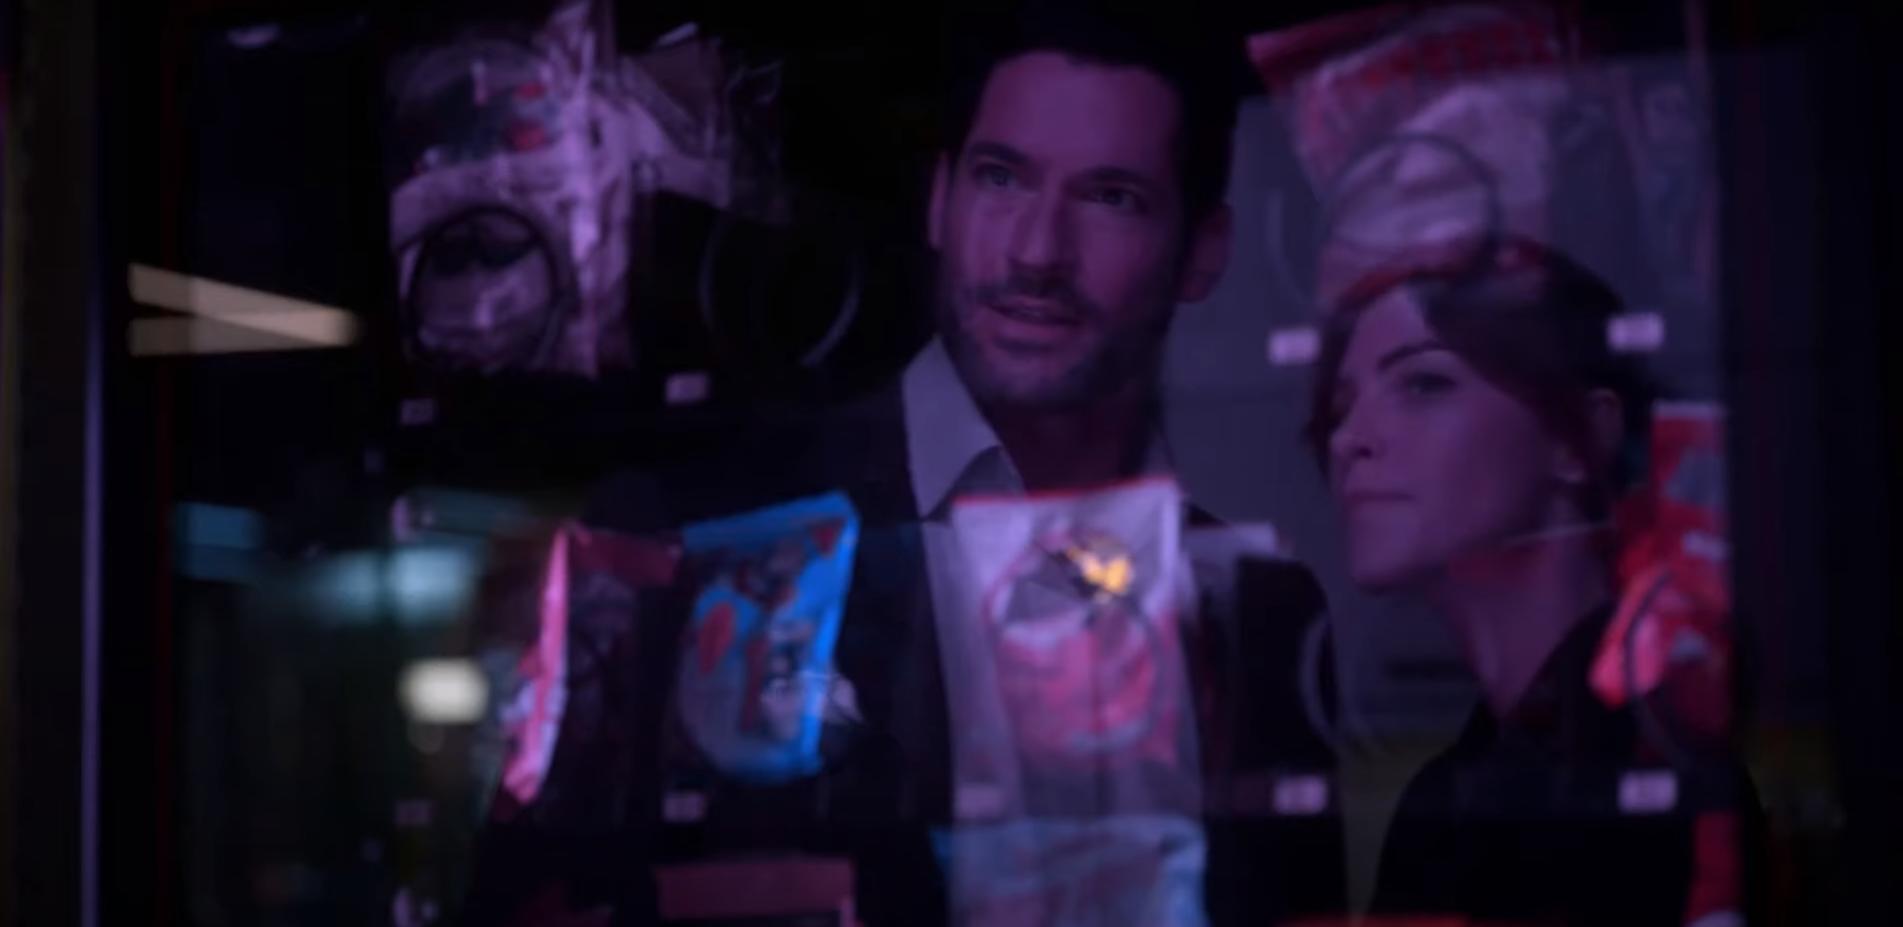 Скриншот из сериала Люцифер 5 сезон Люцифер и Хлоя